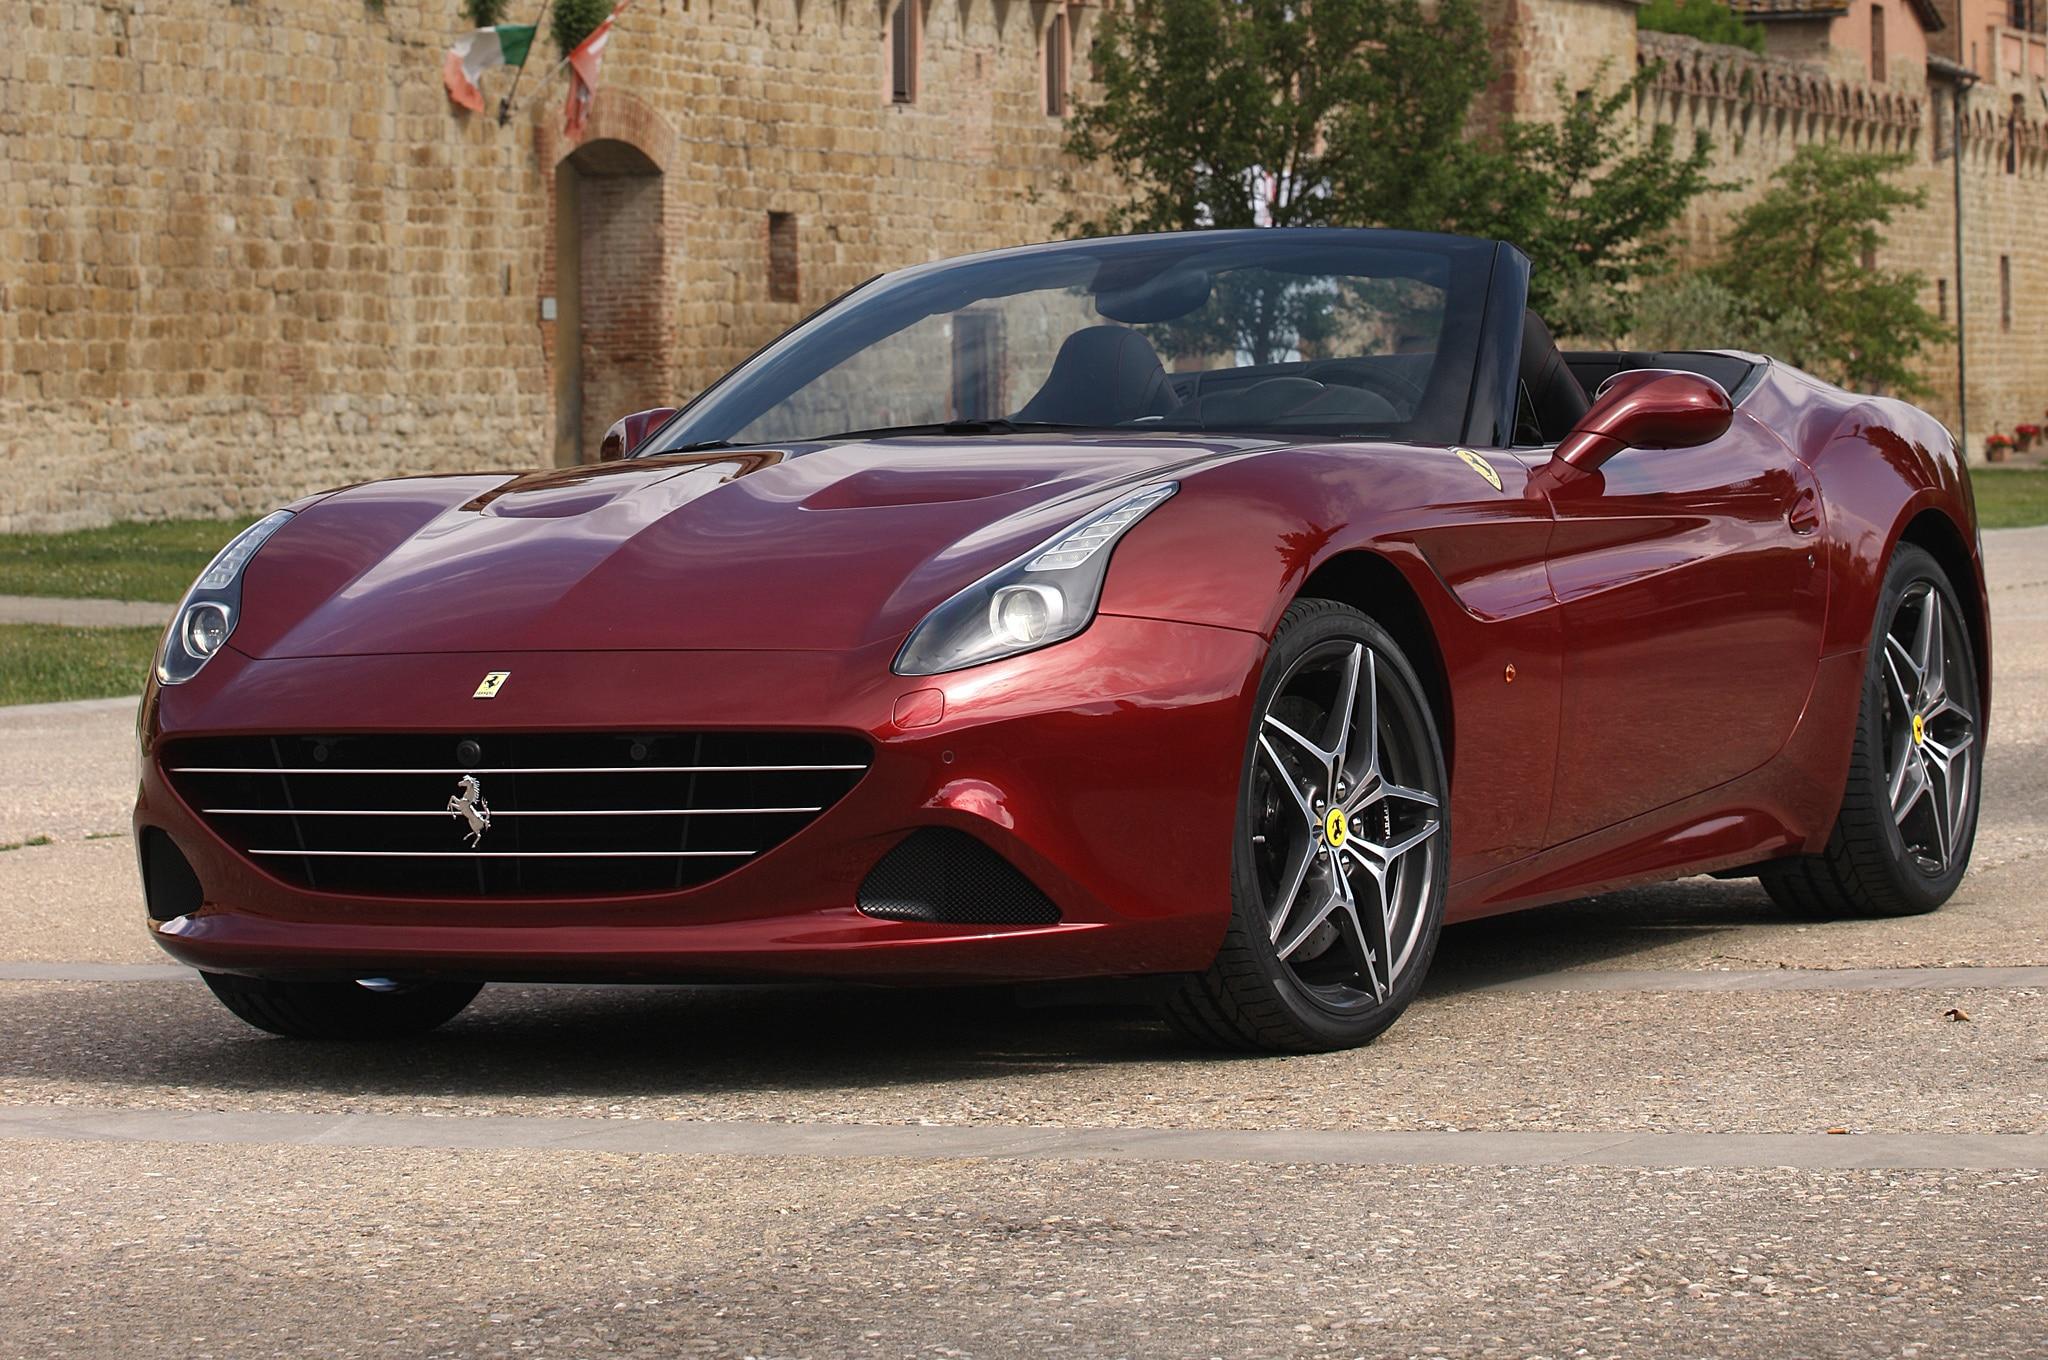 2015 Ferrari California T Front Side View